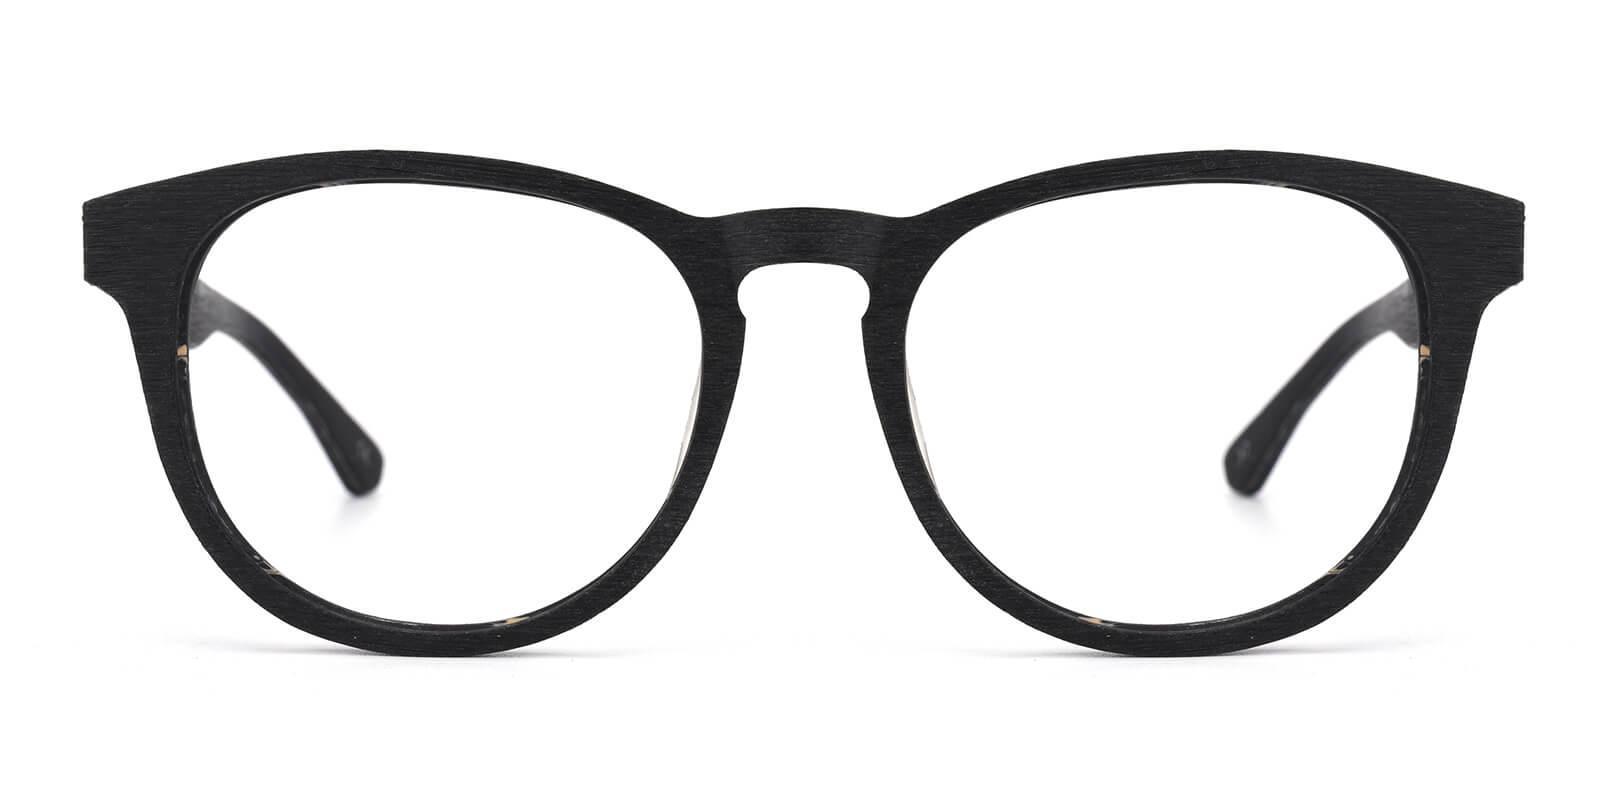 Rechela-Black-Round-Acetate-Eyeglasses-additional2